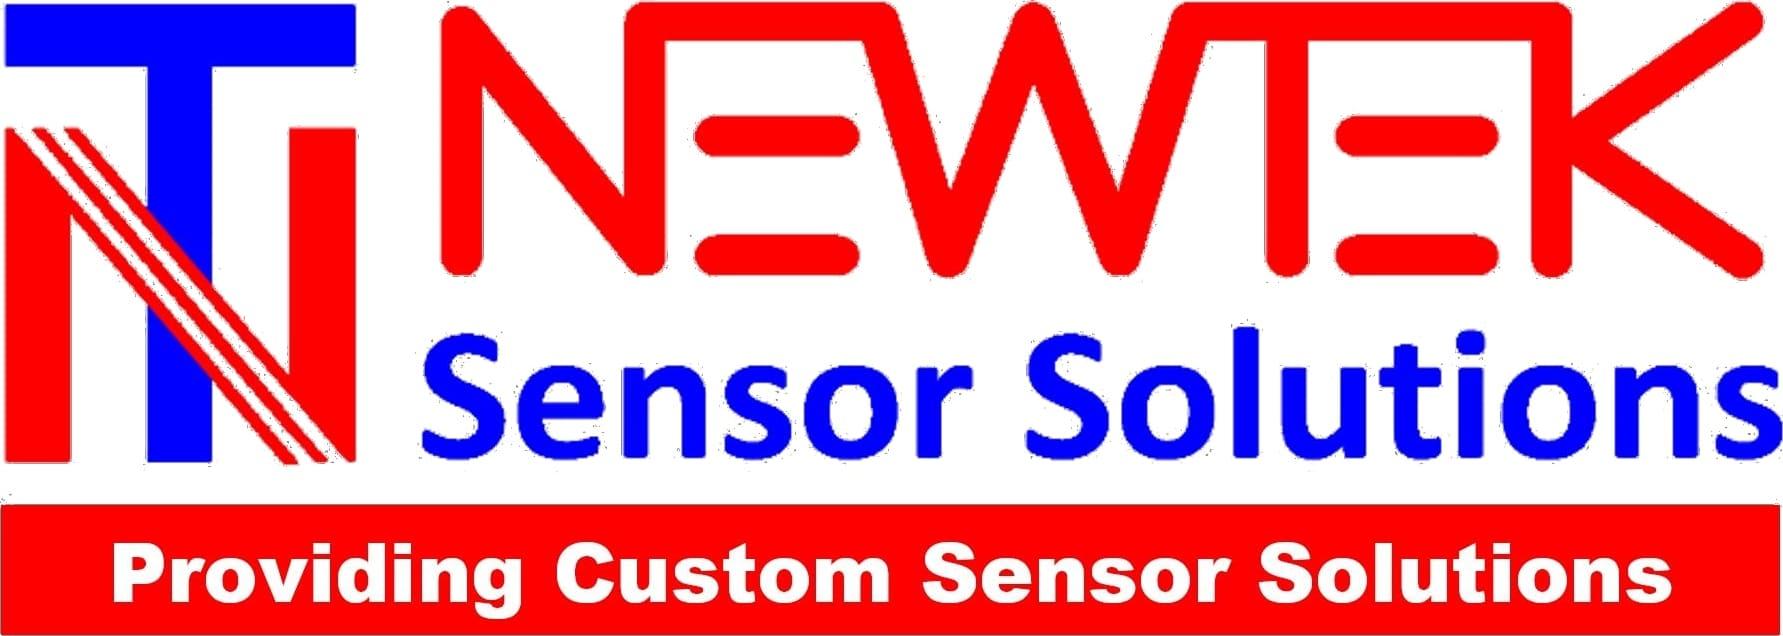 NewTek Sensor Solutions Company Logo 2020